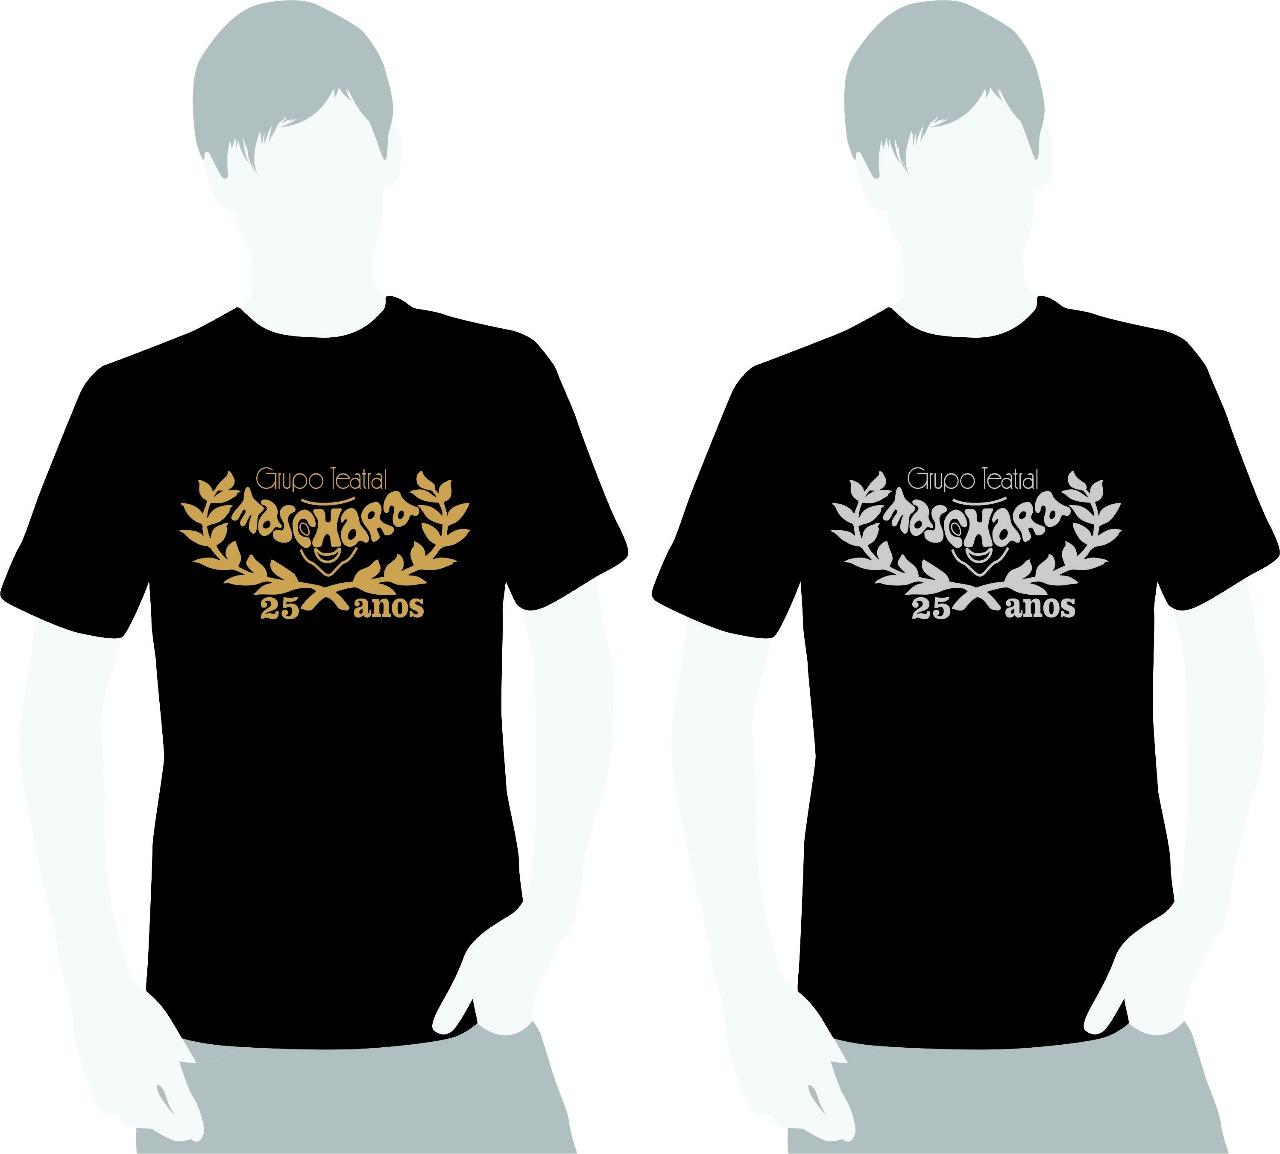 Camisetas comemorativas. Adquira a sua